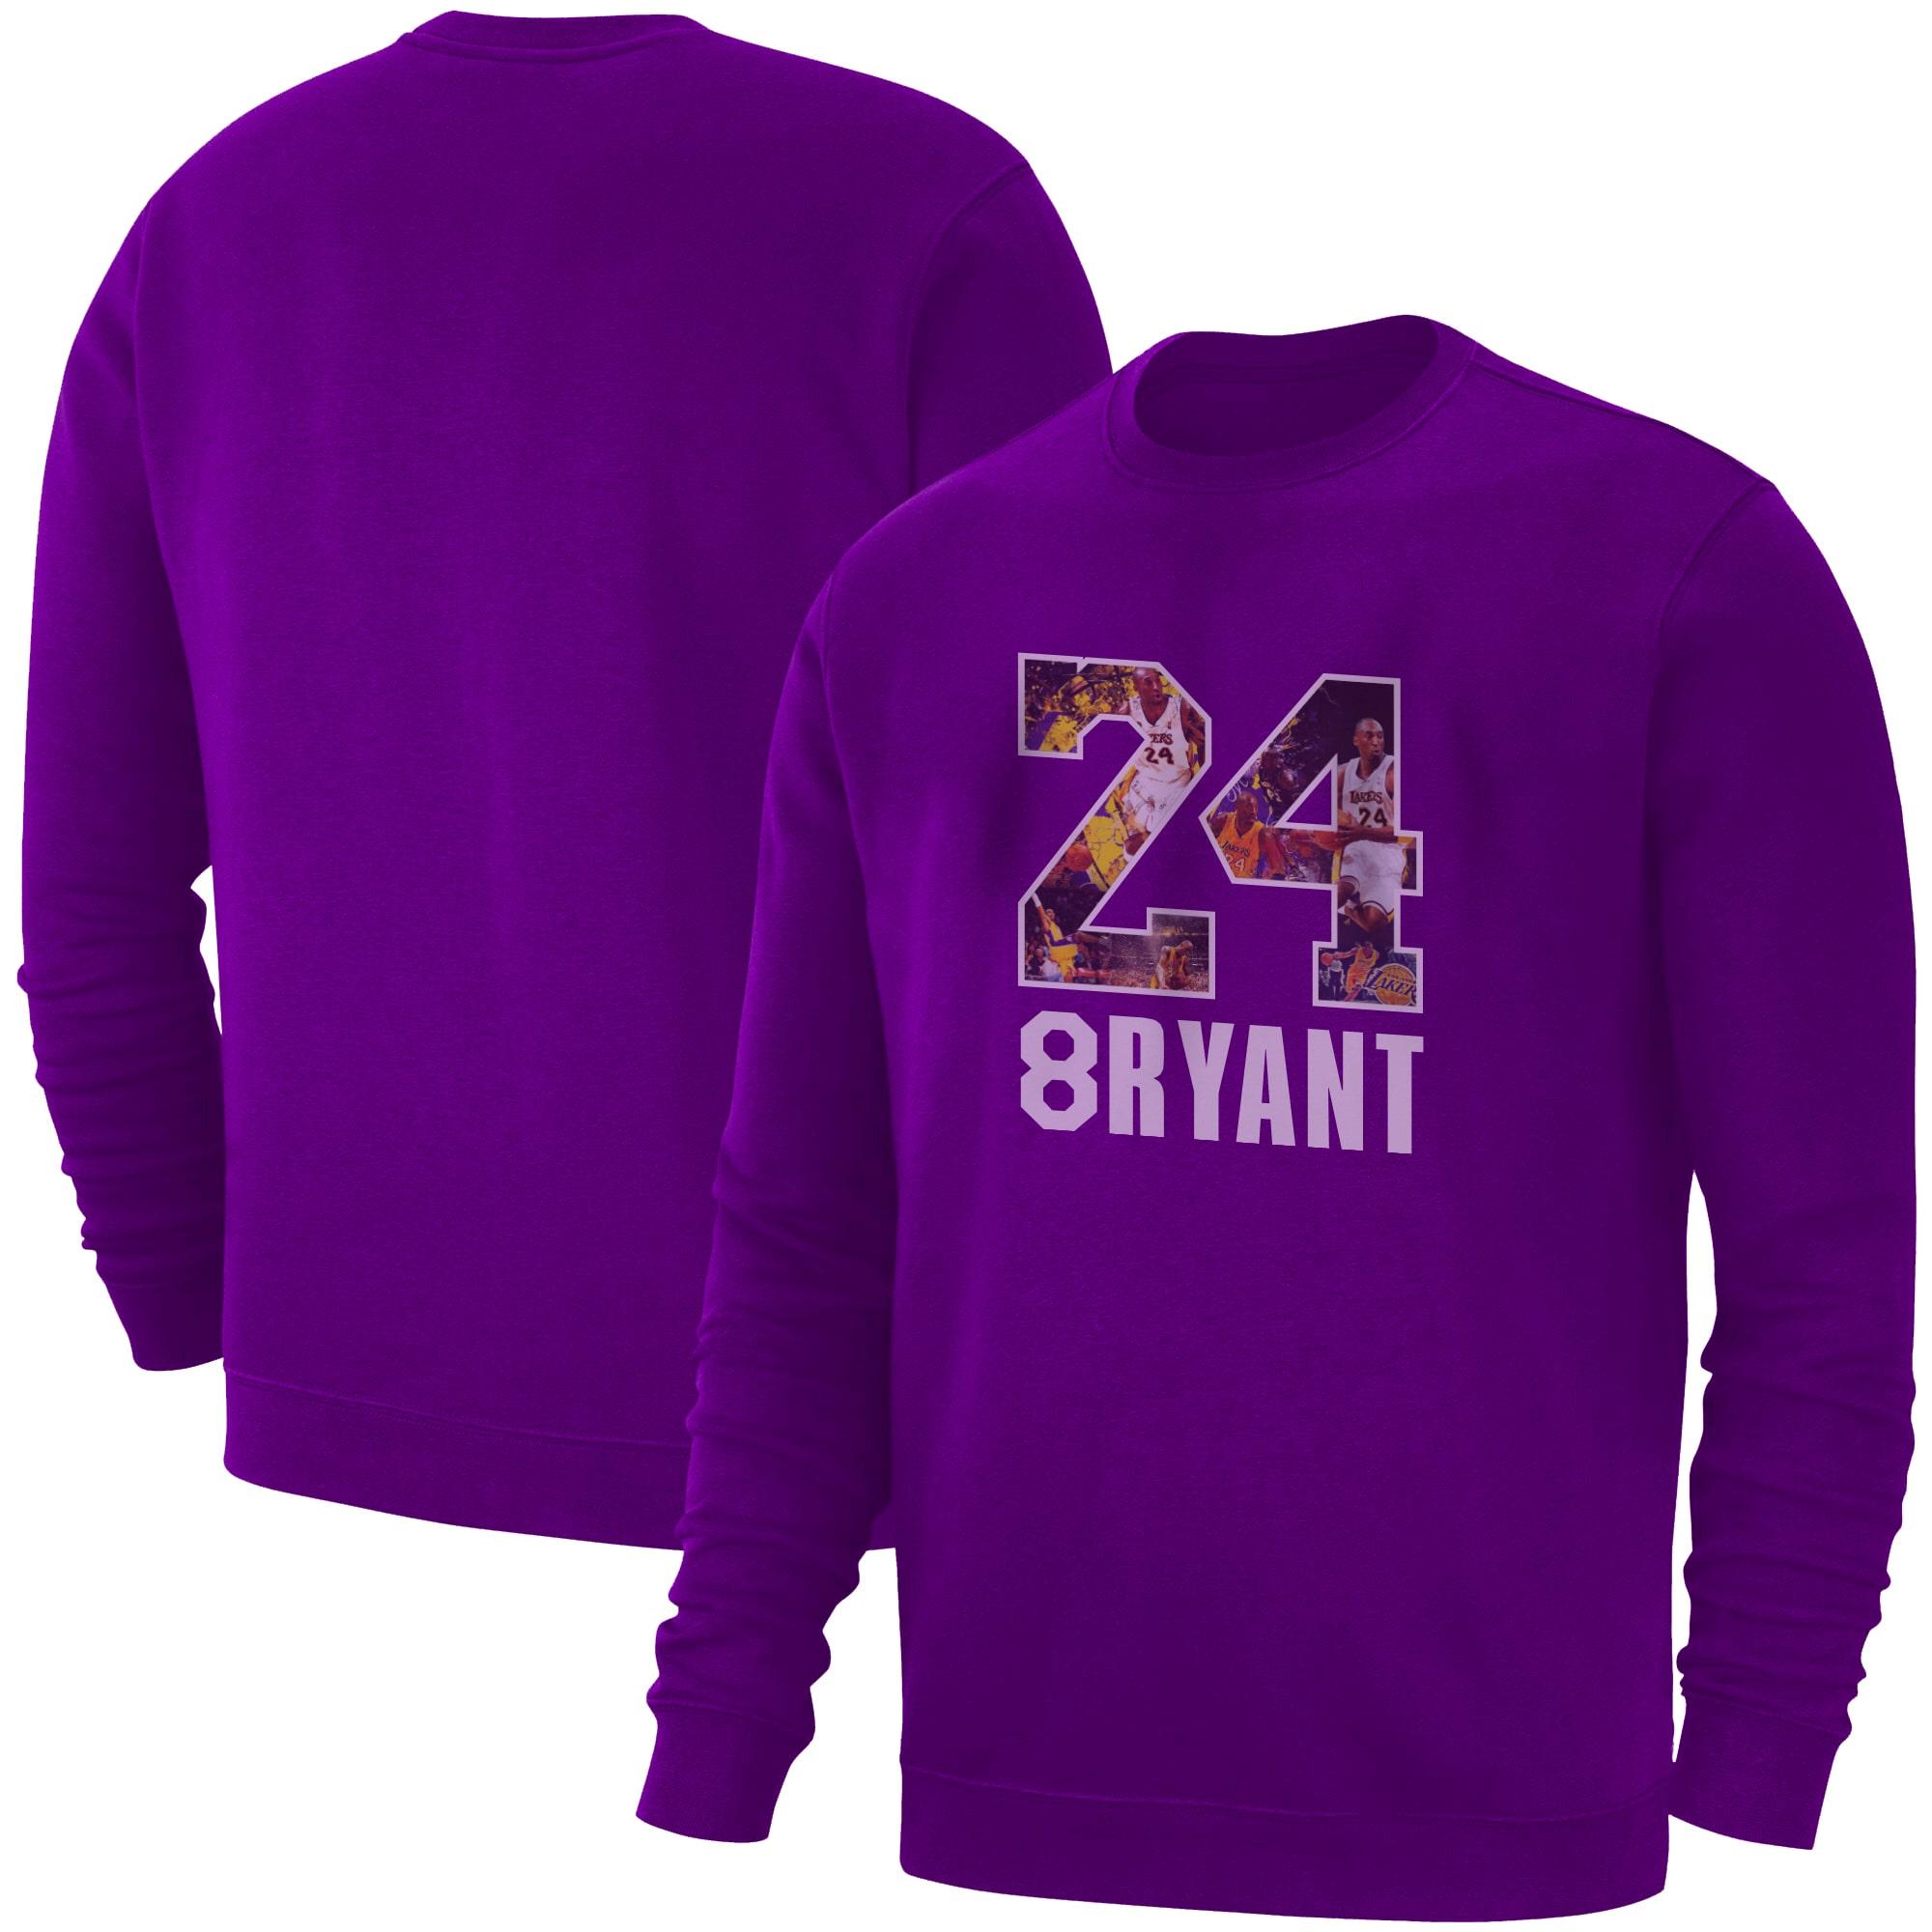 Kobe Bryant Basic (BSC-PRP-NP-141-PLYR-LAL-KOBE.24-SIGN)